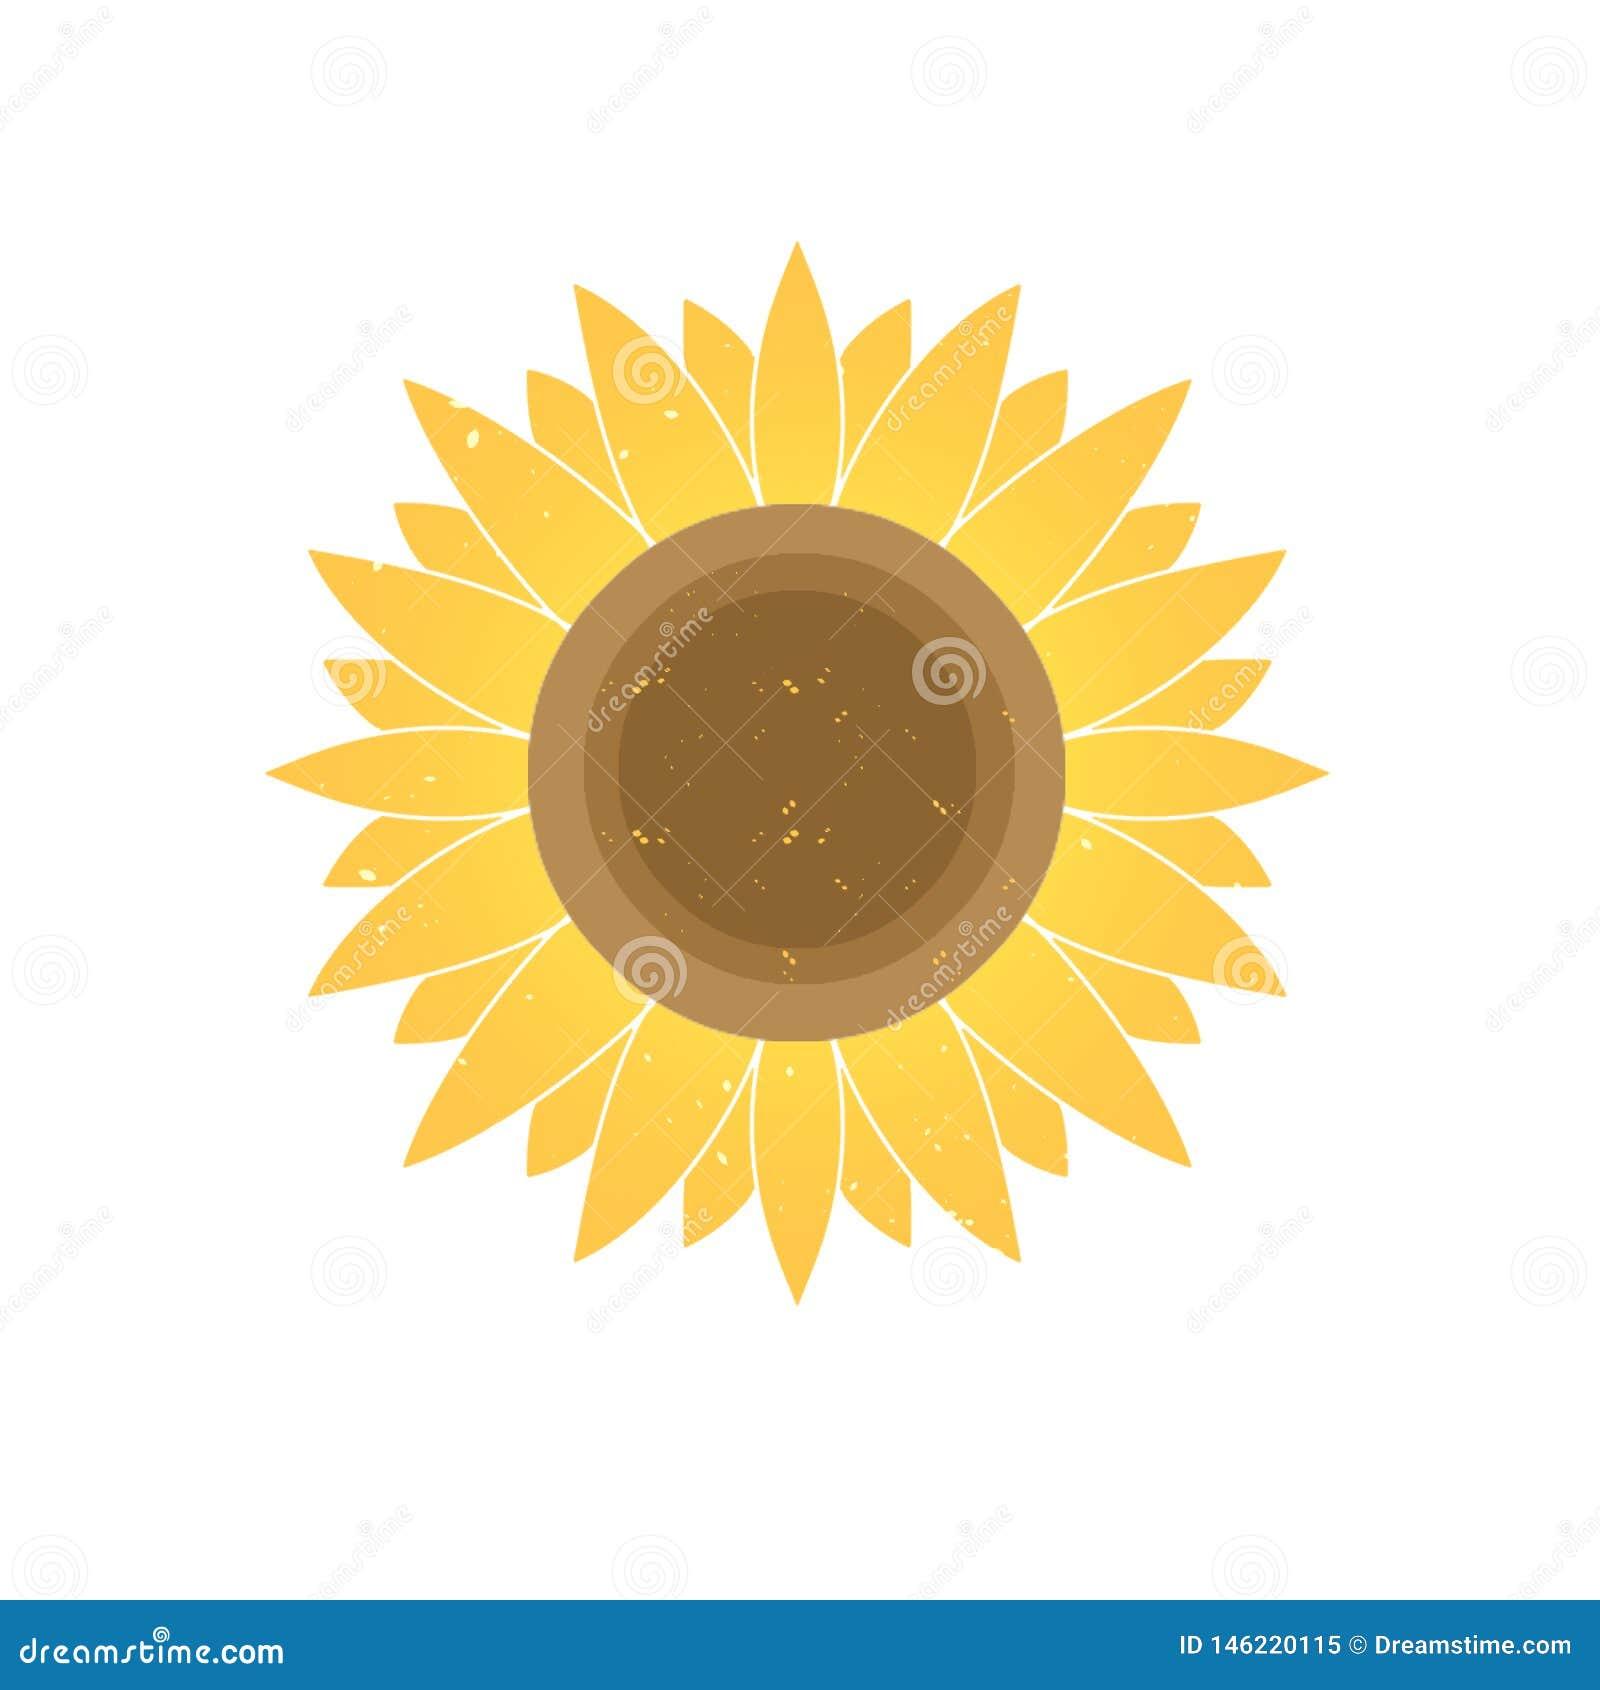 Graphic design gradient yellow sunflower